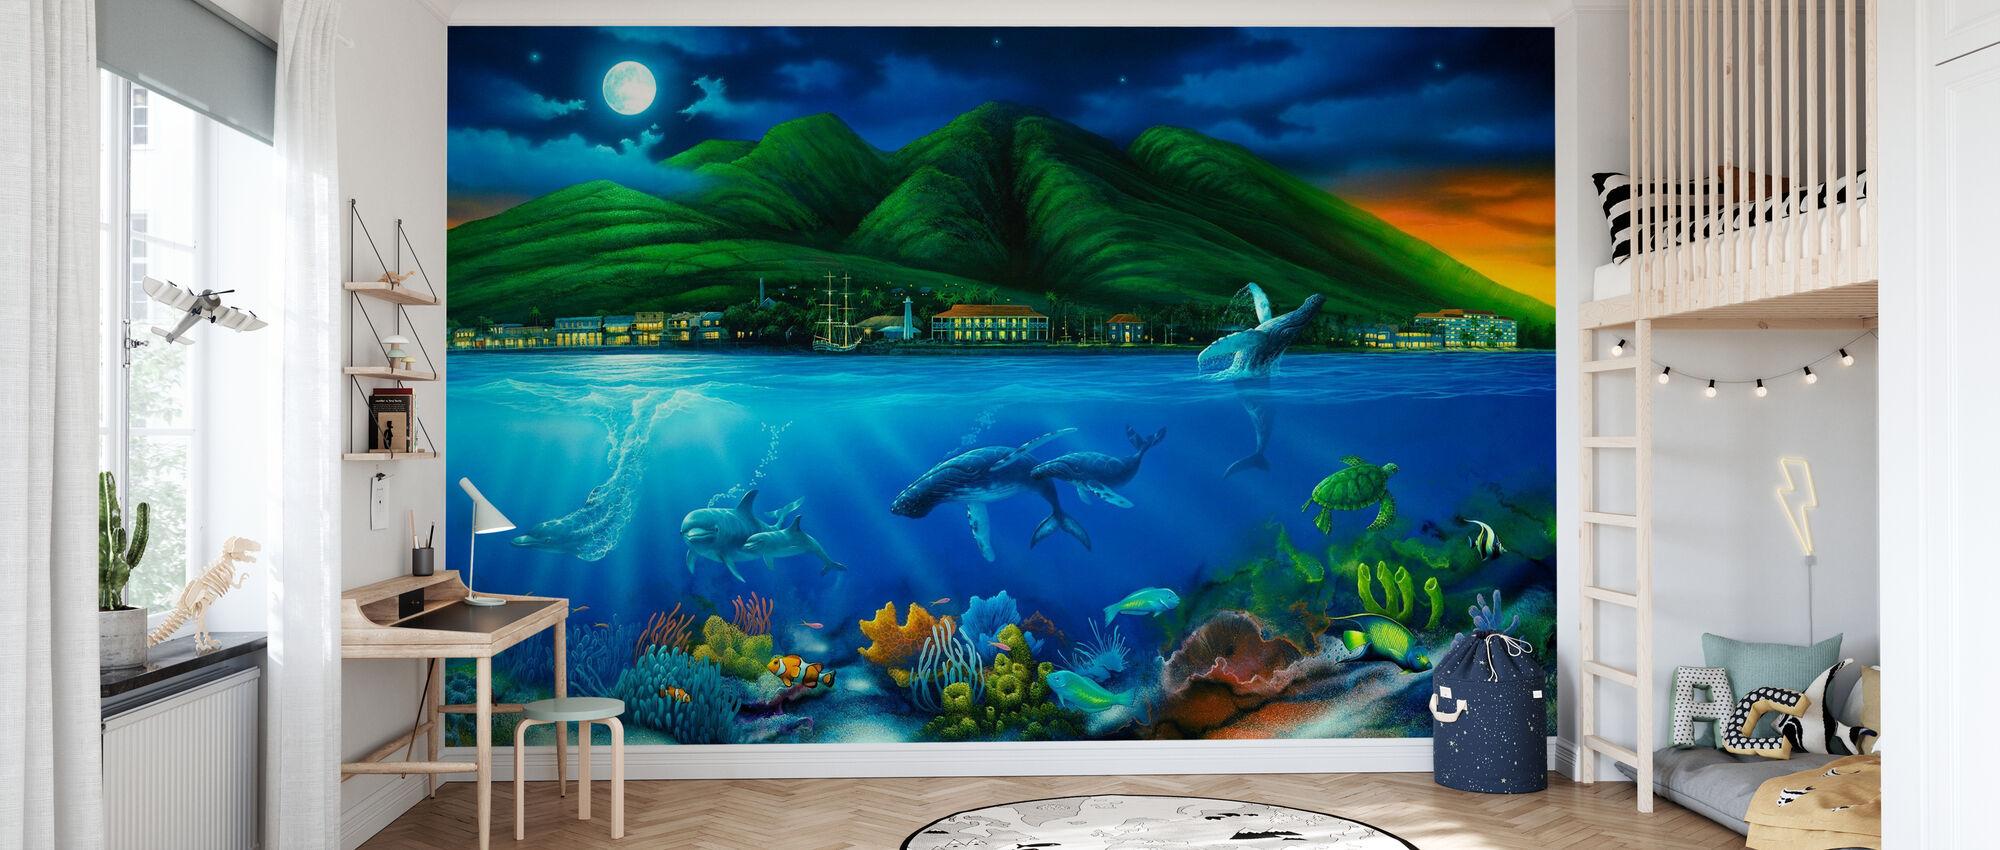 Lahaina Moon - Wallpaper - Kids Room